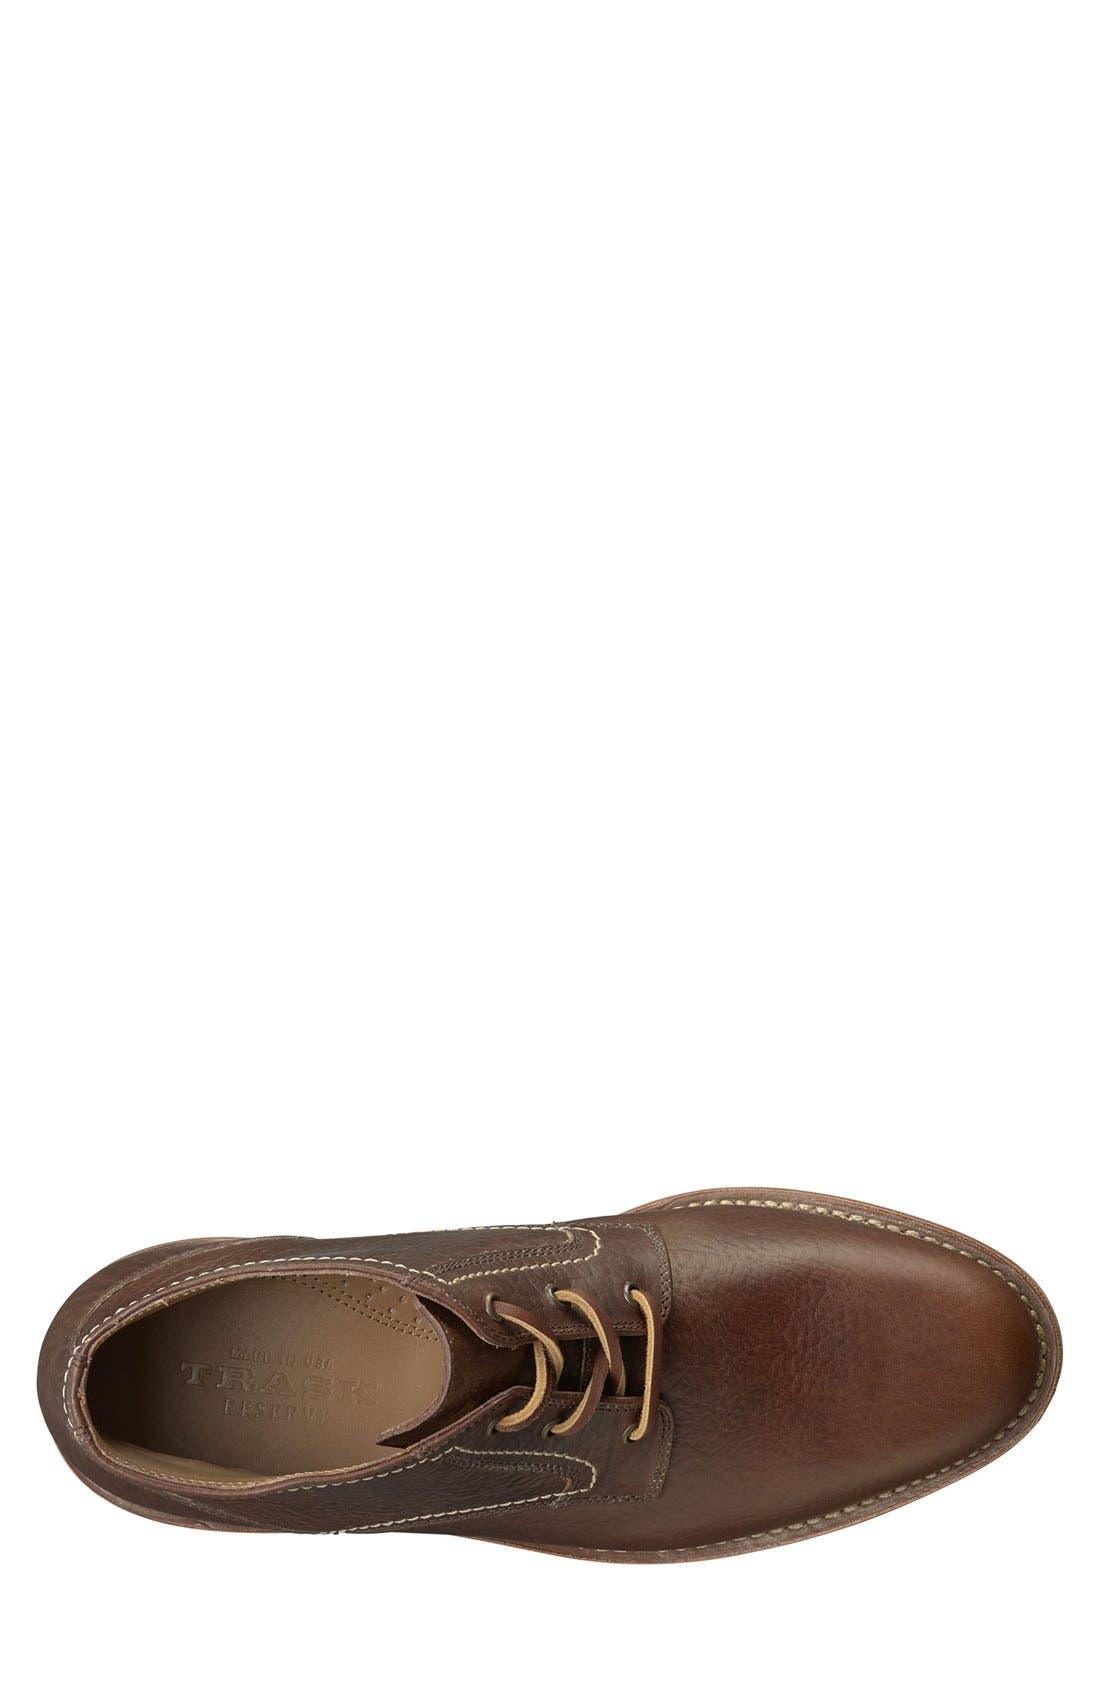 'Bighorn' Plain Toe Boot,                             Alternate thumbnail 7, color,